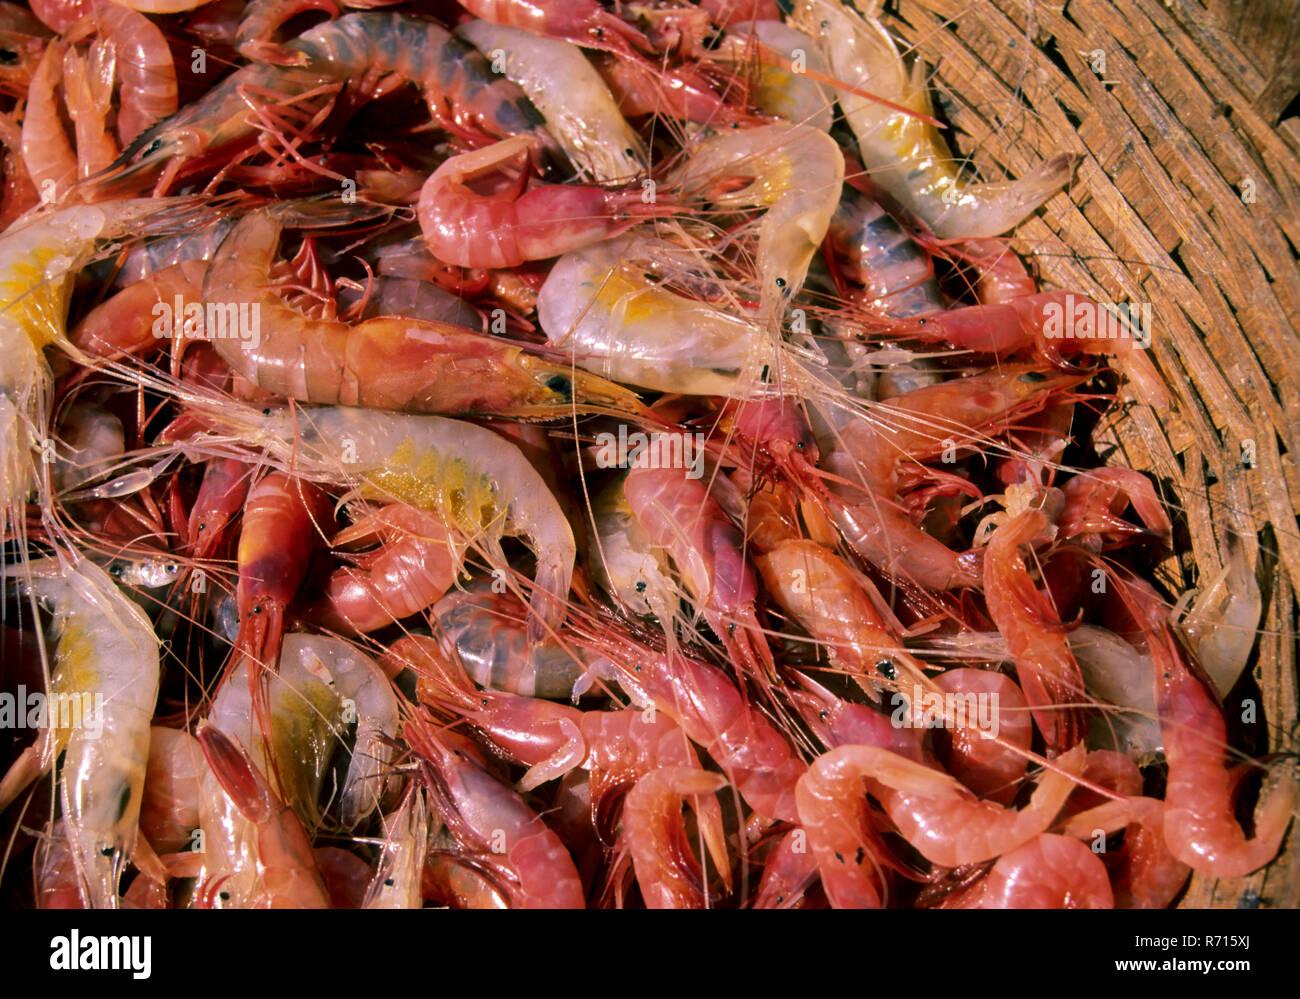 Non Vegetarian Food Fresh Prawns Red And White Sea Food Stock Photo Alamy